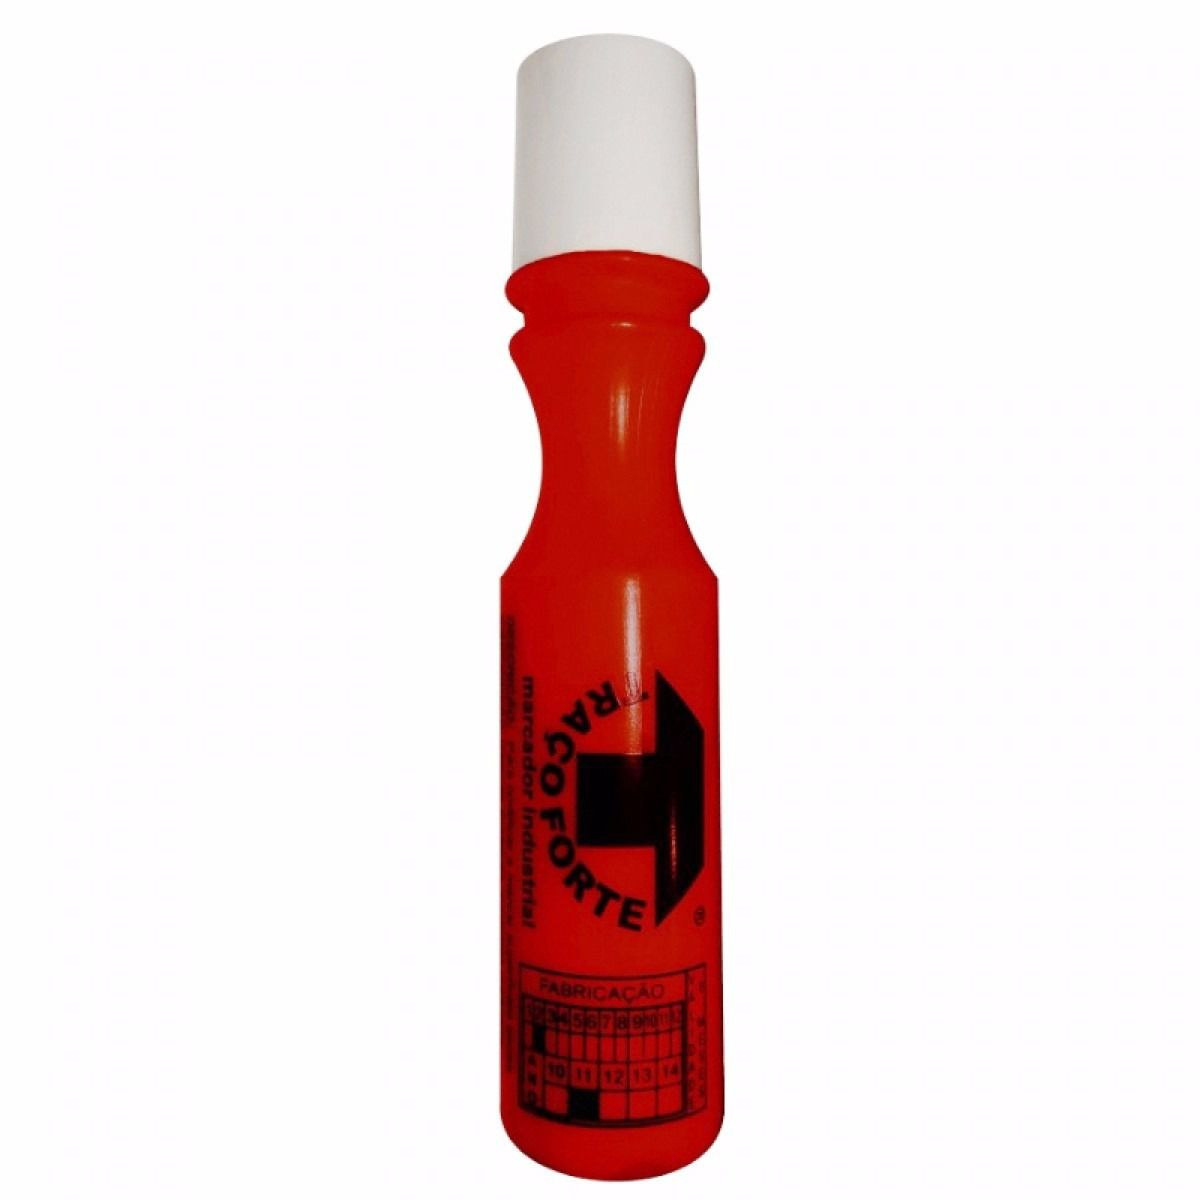 Marcador Industrial Vermelho 60ml 3mm Traço Forte - Baden